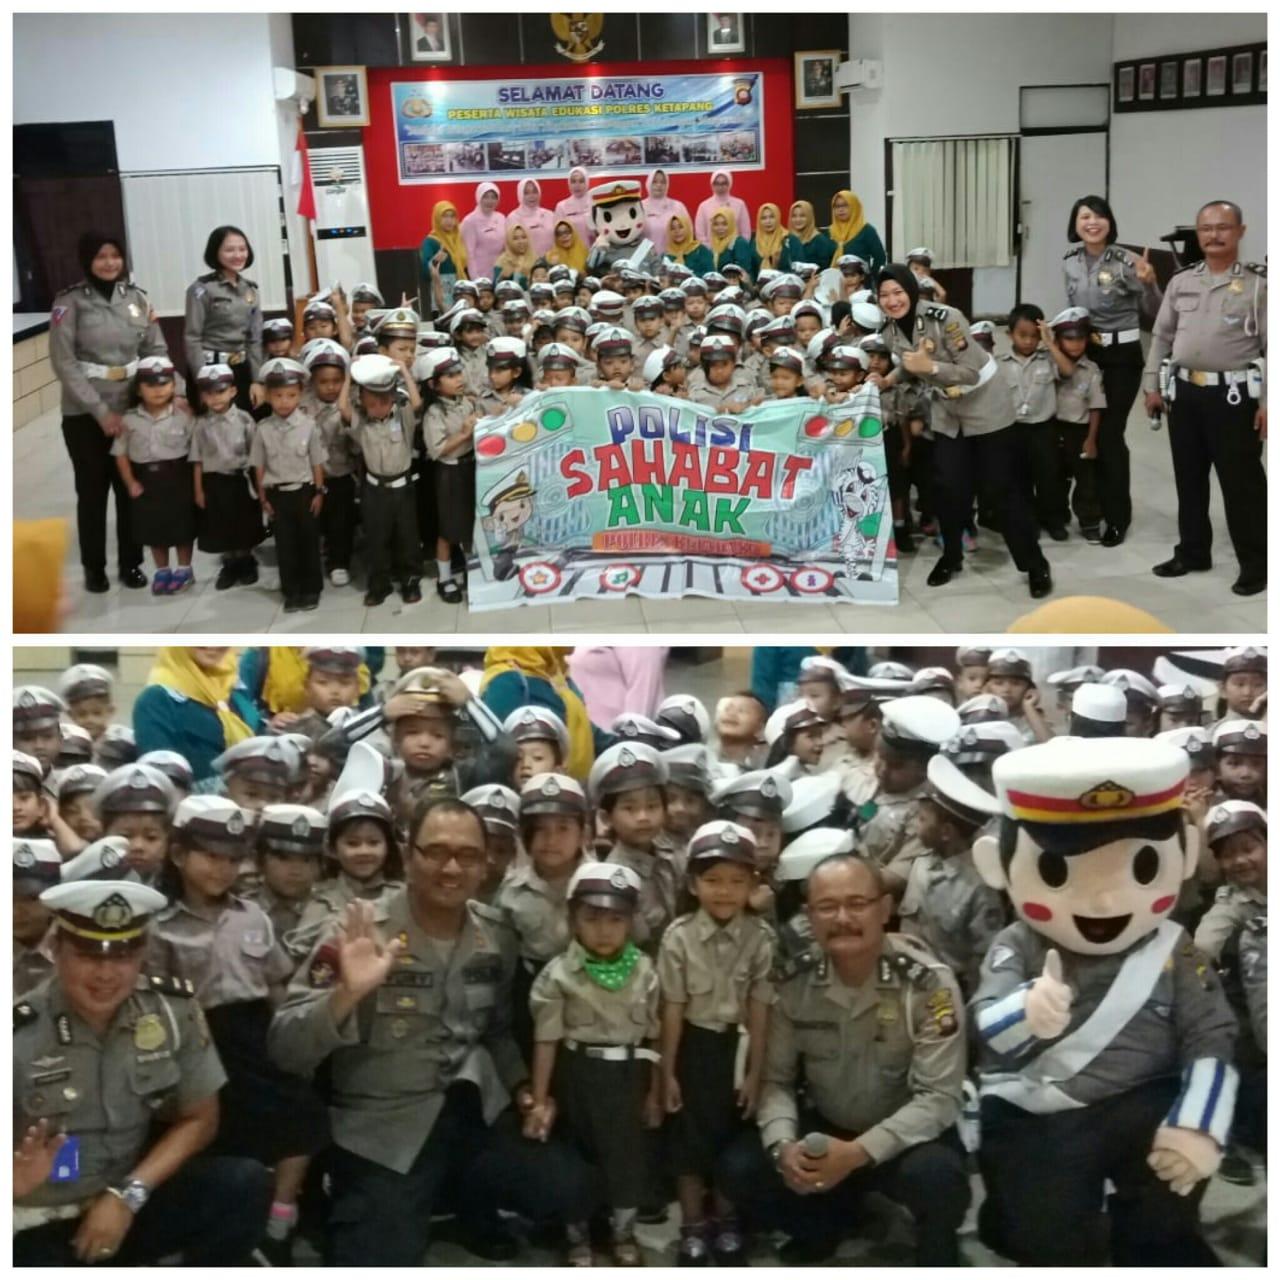 Satlantas Polres Ketapang menggelar wisata edukasi bersama TK Bhayangkari Ketapang